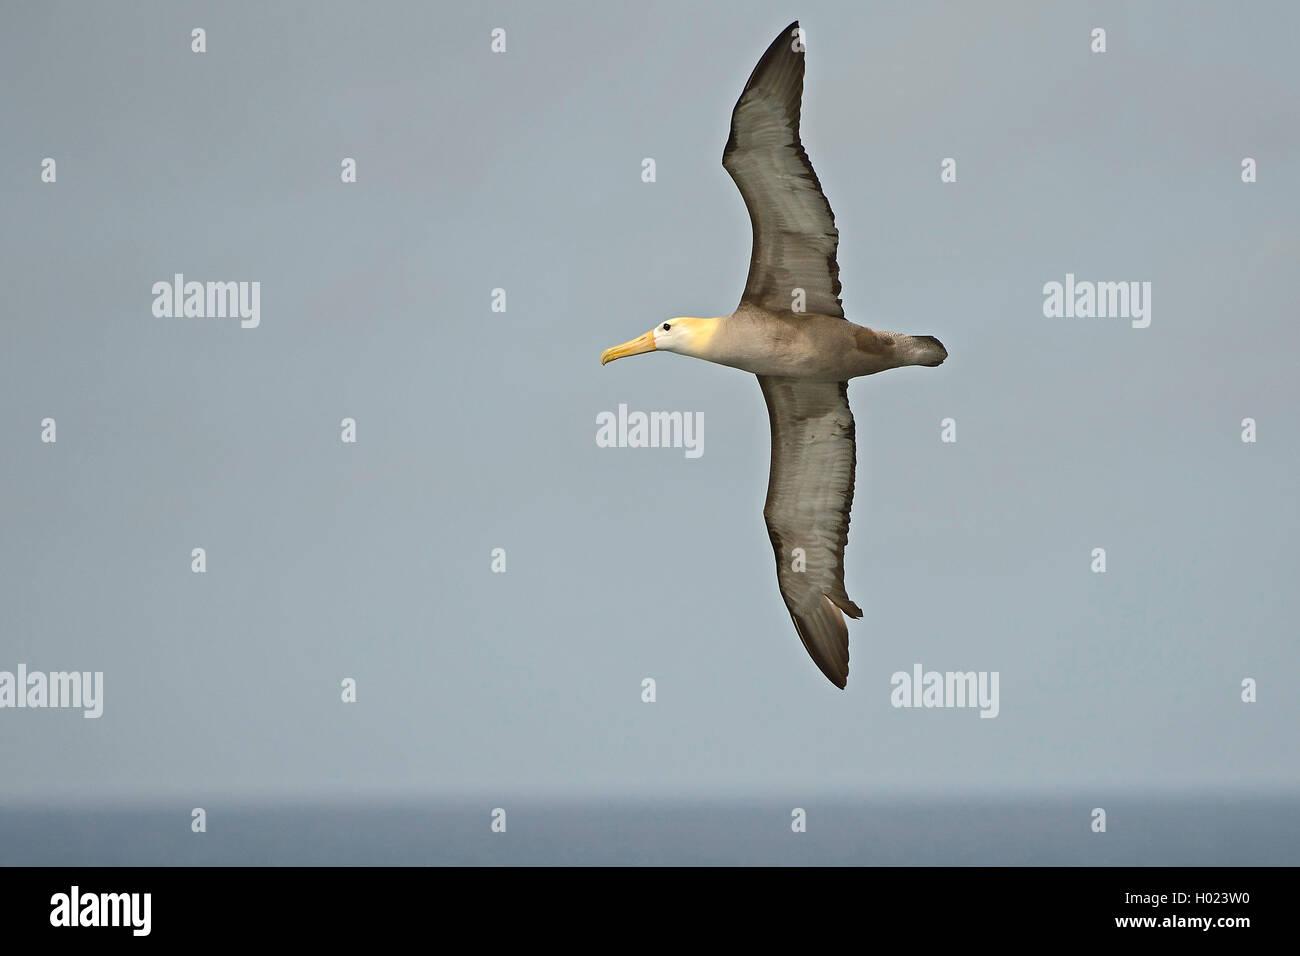 Galapagosalbatros, Galapagos-Albatros (Diomedea irrorata, Phoebastria irrorata), im Flug, Ecuador, Galapagos-Inseln, - Stock Image